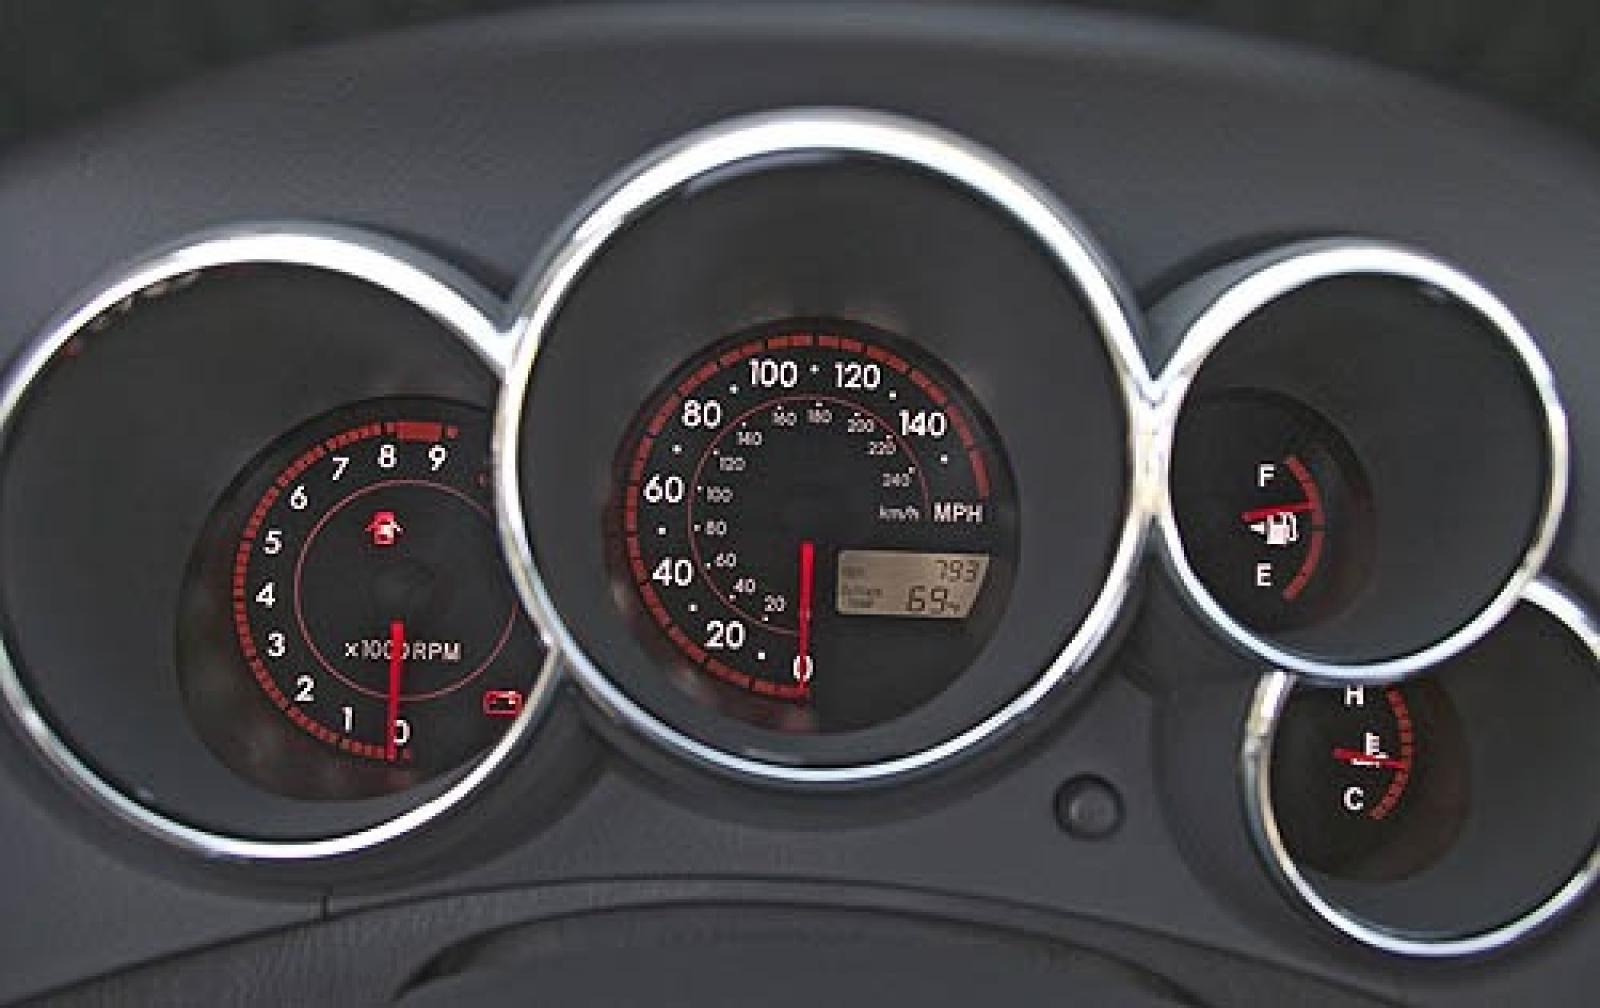 2006 Toyota Matrix  Information and photos  ZombieDrive